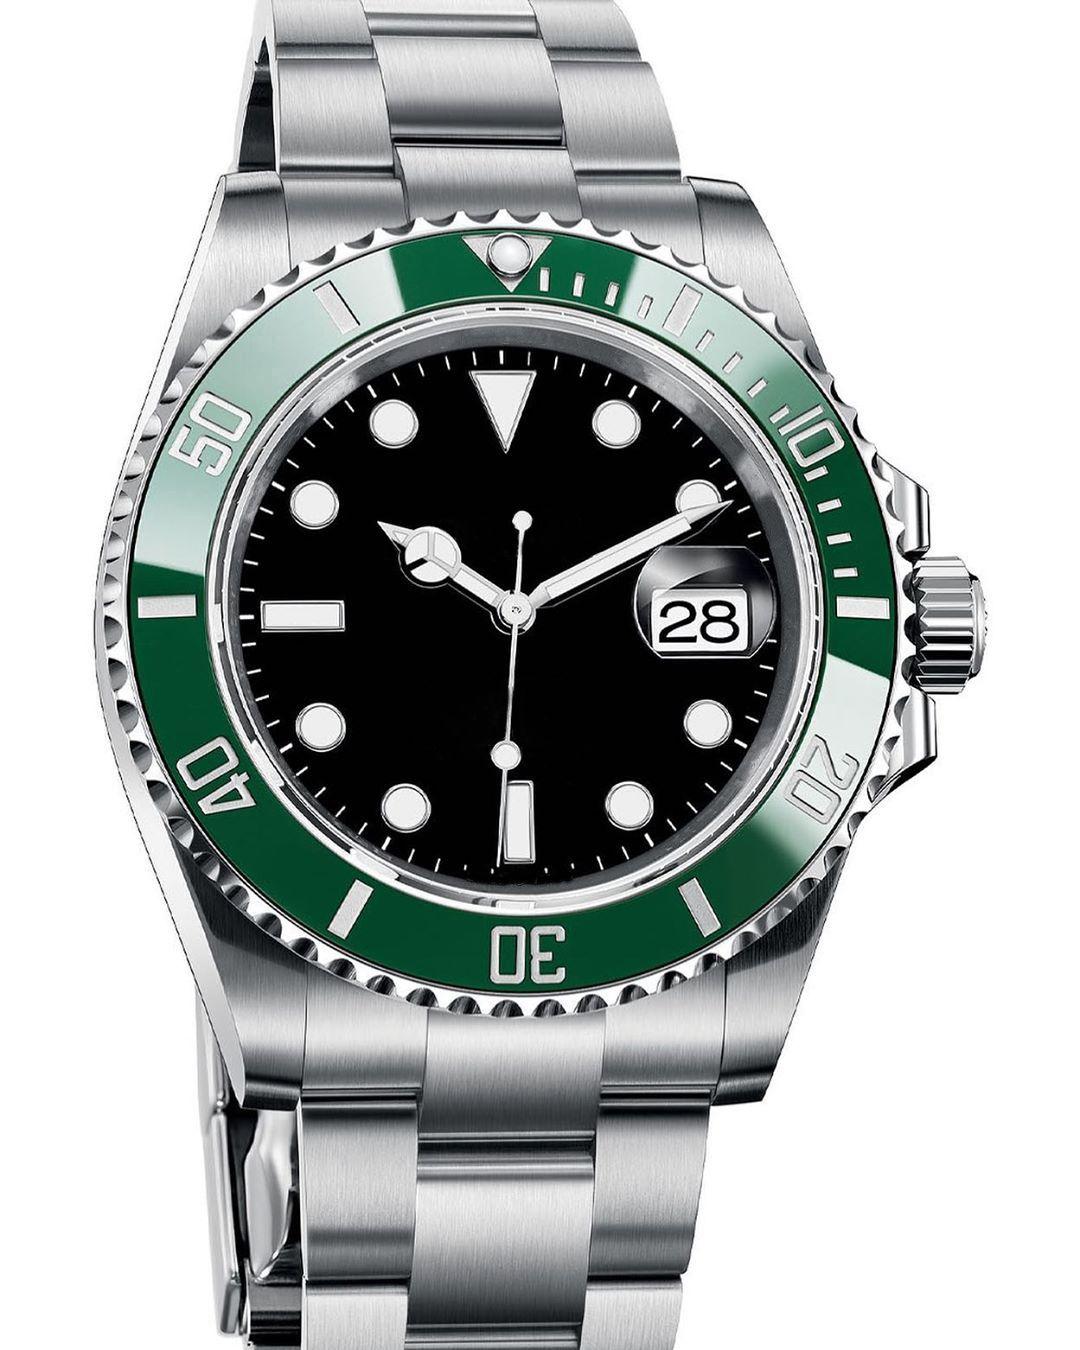 Cerámica Bisel Moda Mujeres Lady Master Men Hombres Movimiento Mecánico Automático Tag GMT Designer Reloj Luminous Diamond Wristwatches Relojes